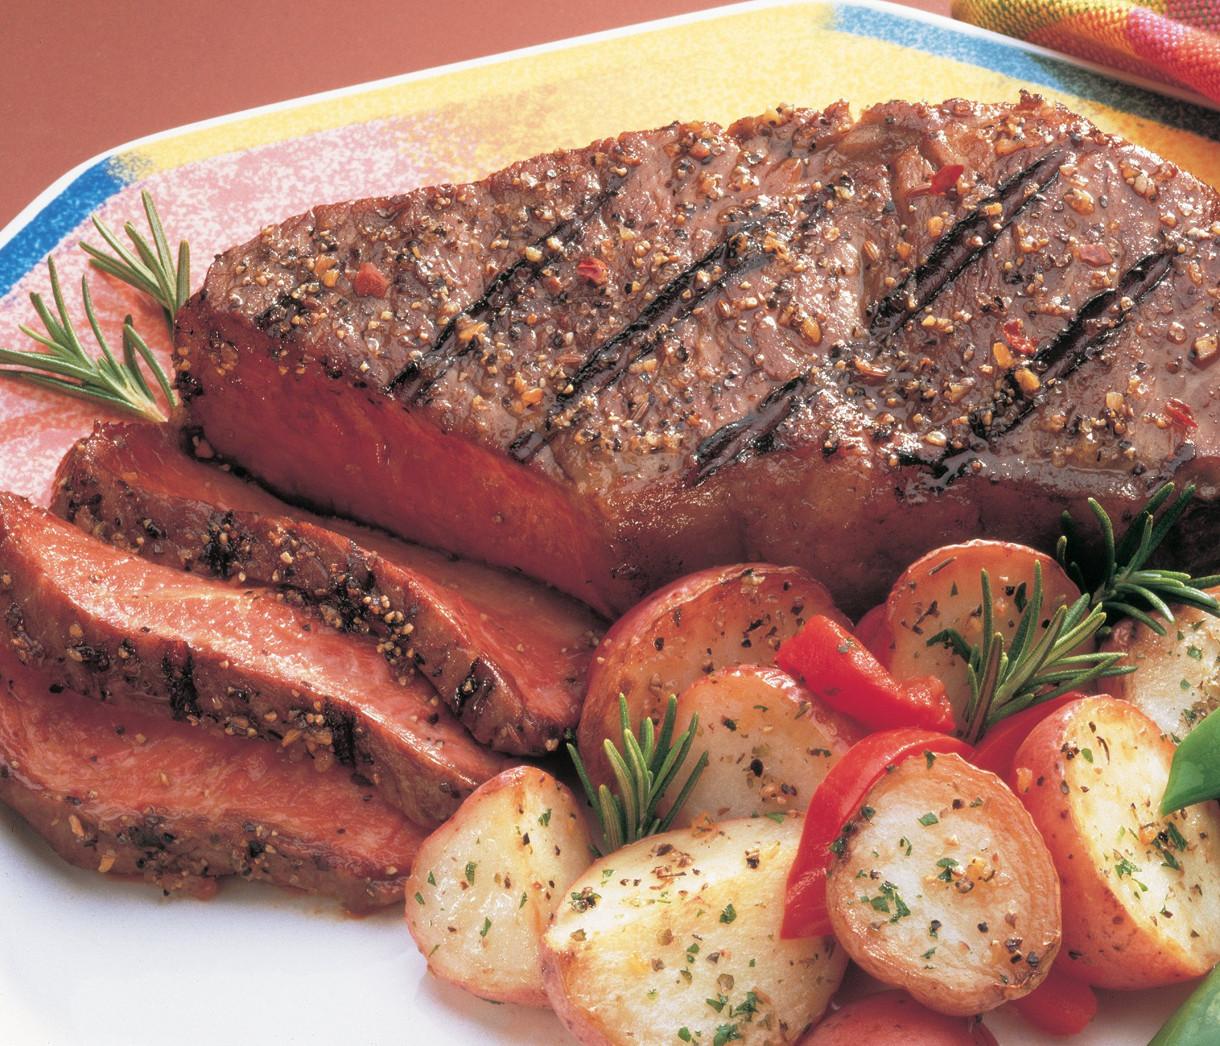 Great Steak And Potato  Patrick1212 blog My last supper